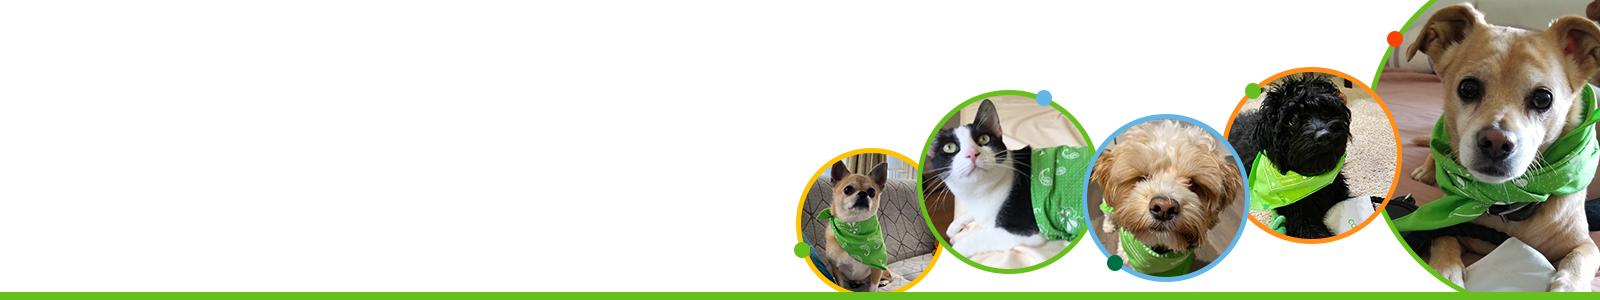 Pet Direct Mailer Banner